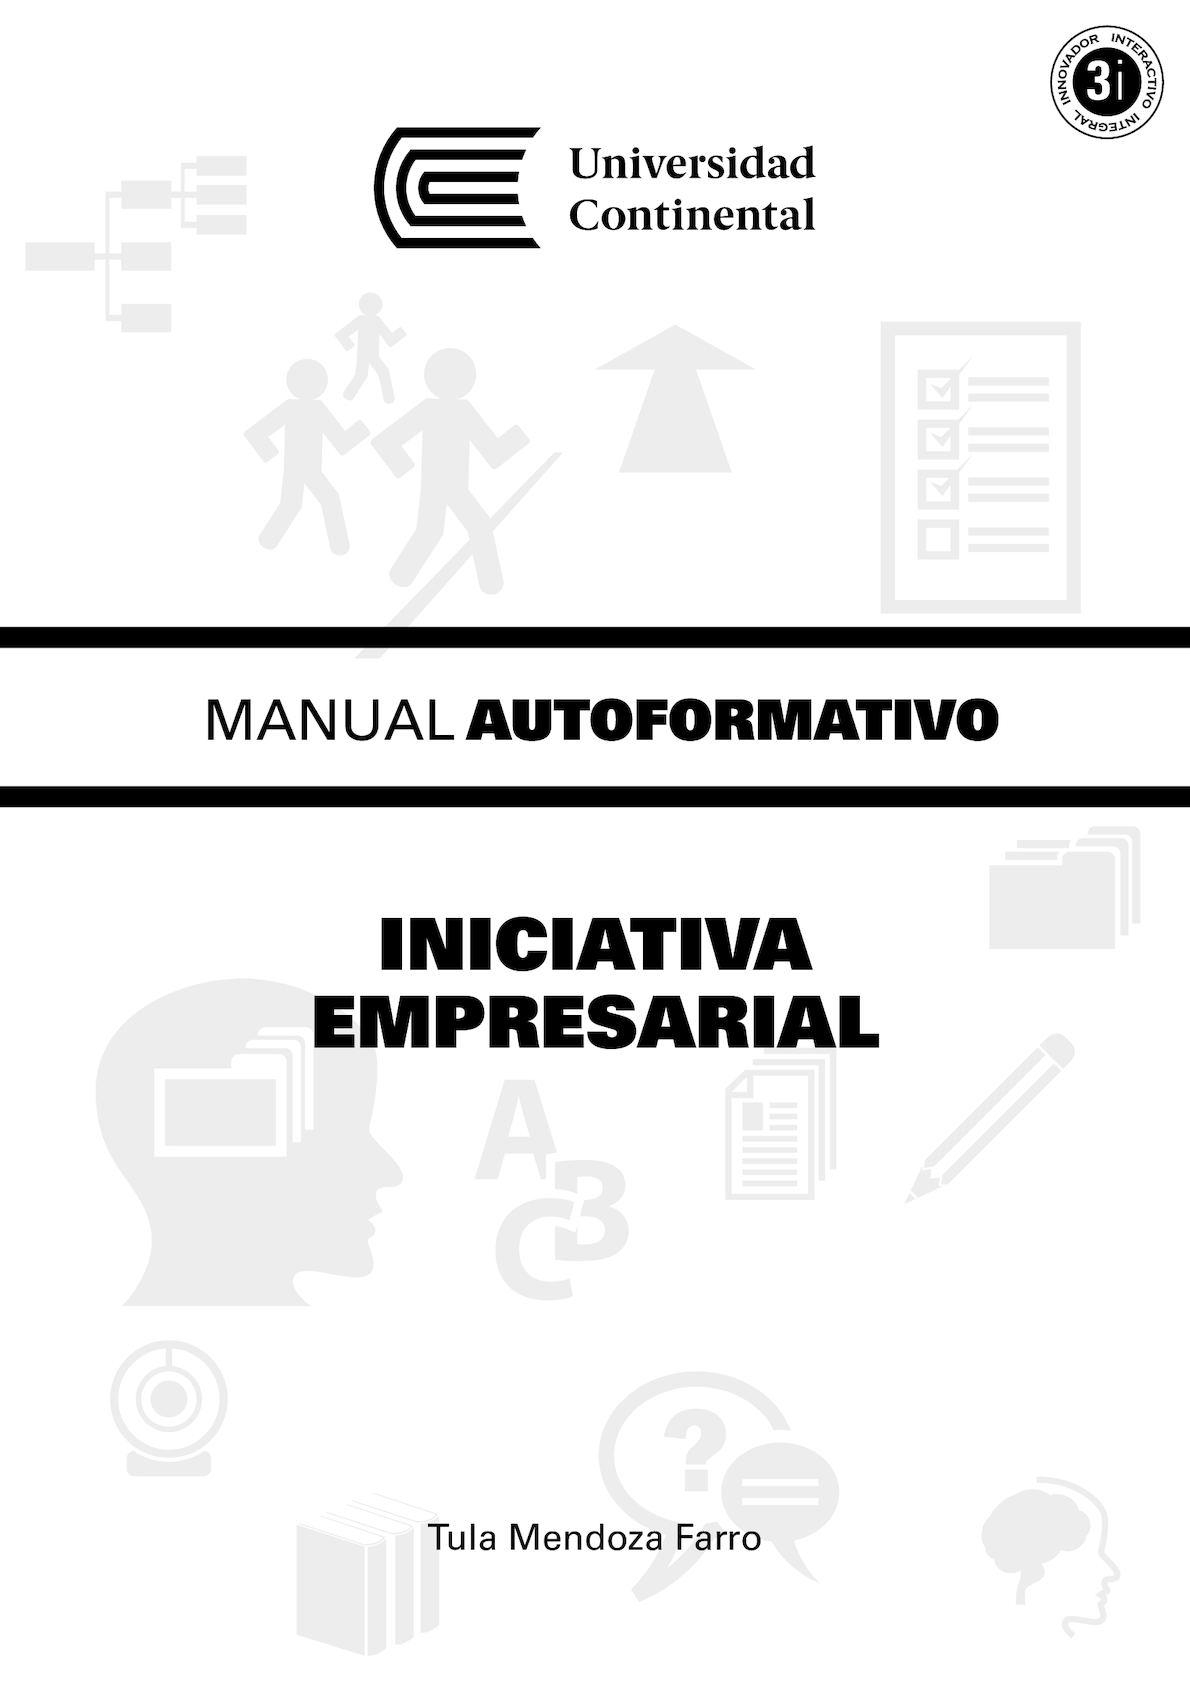 Calaméo - A0255 Ma Iniciativa Empresarial Ed1 V1 2013